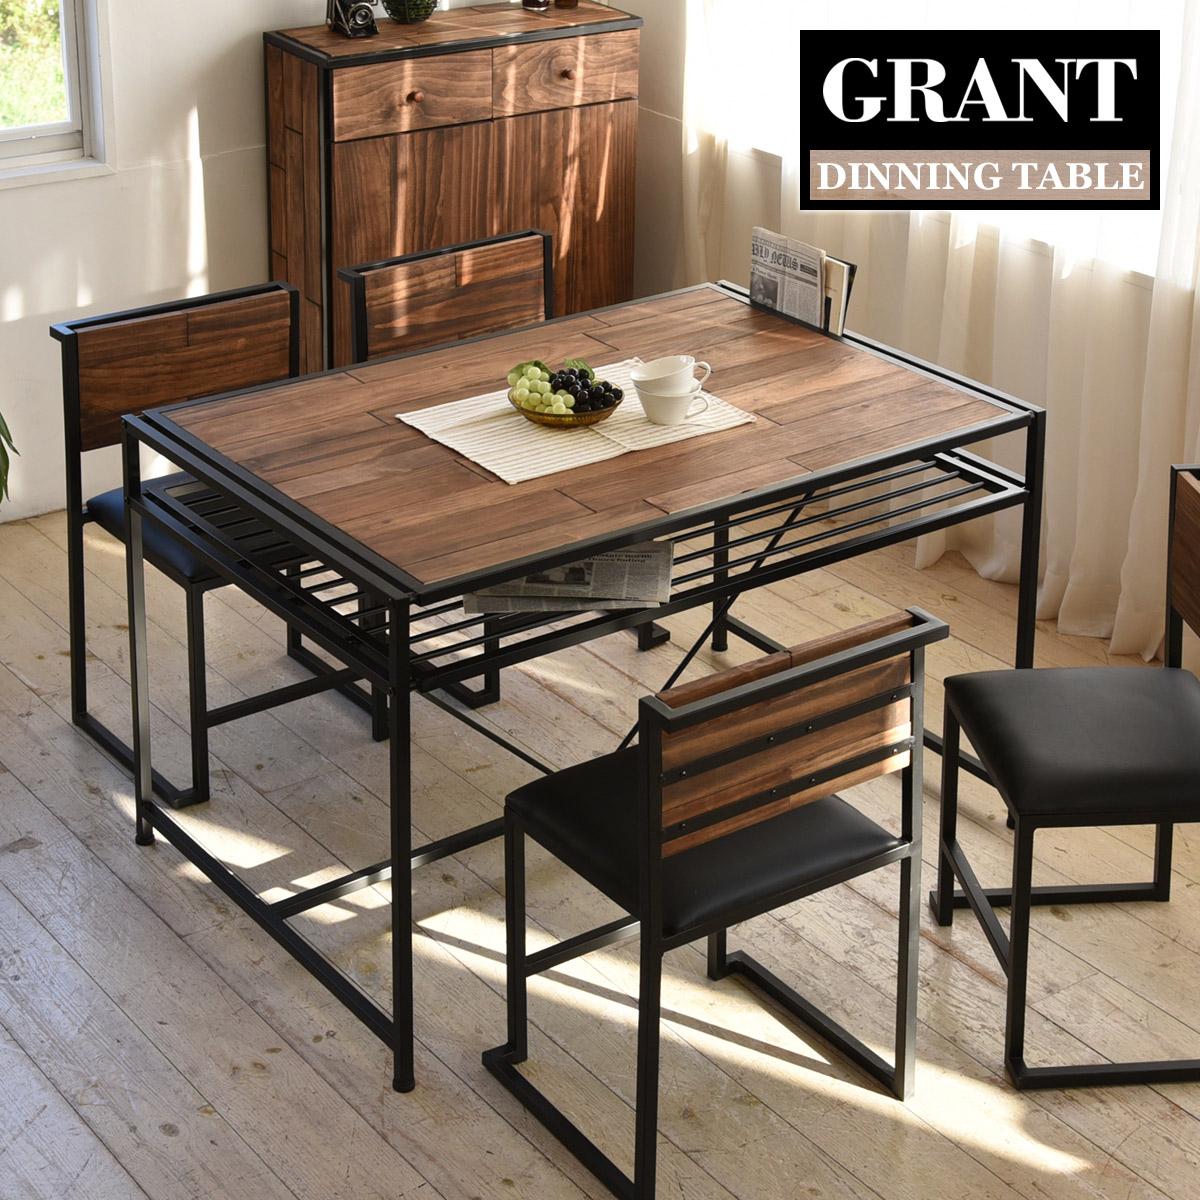 GRANT ダイニングテーブル 幅120 【送料無料 SALE】 グラント GRDT-120 家具 机 食卓 木製 天然木 パイン W1200×D771×H750mm